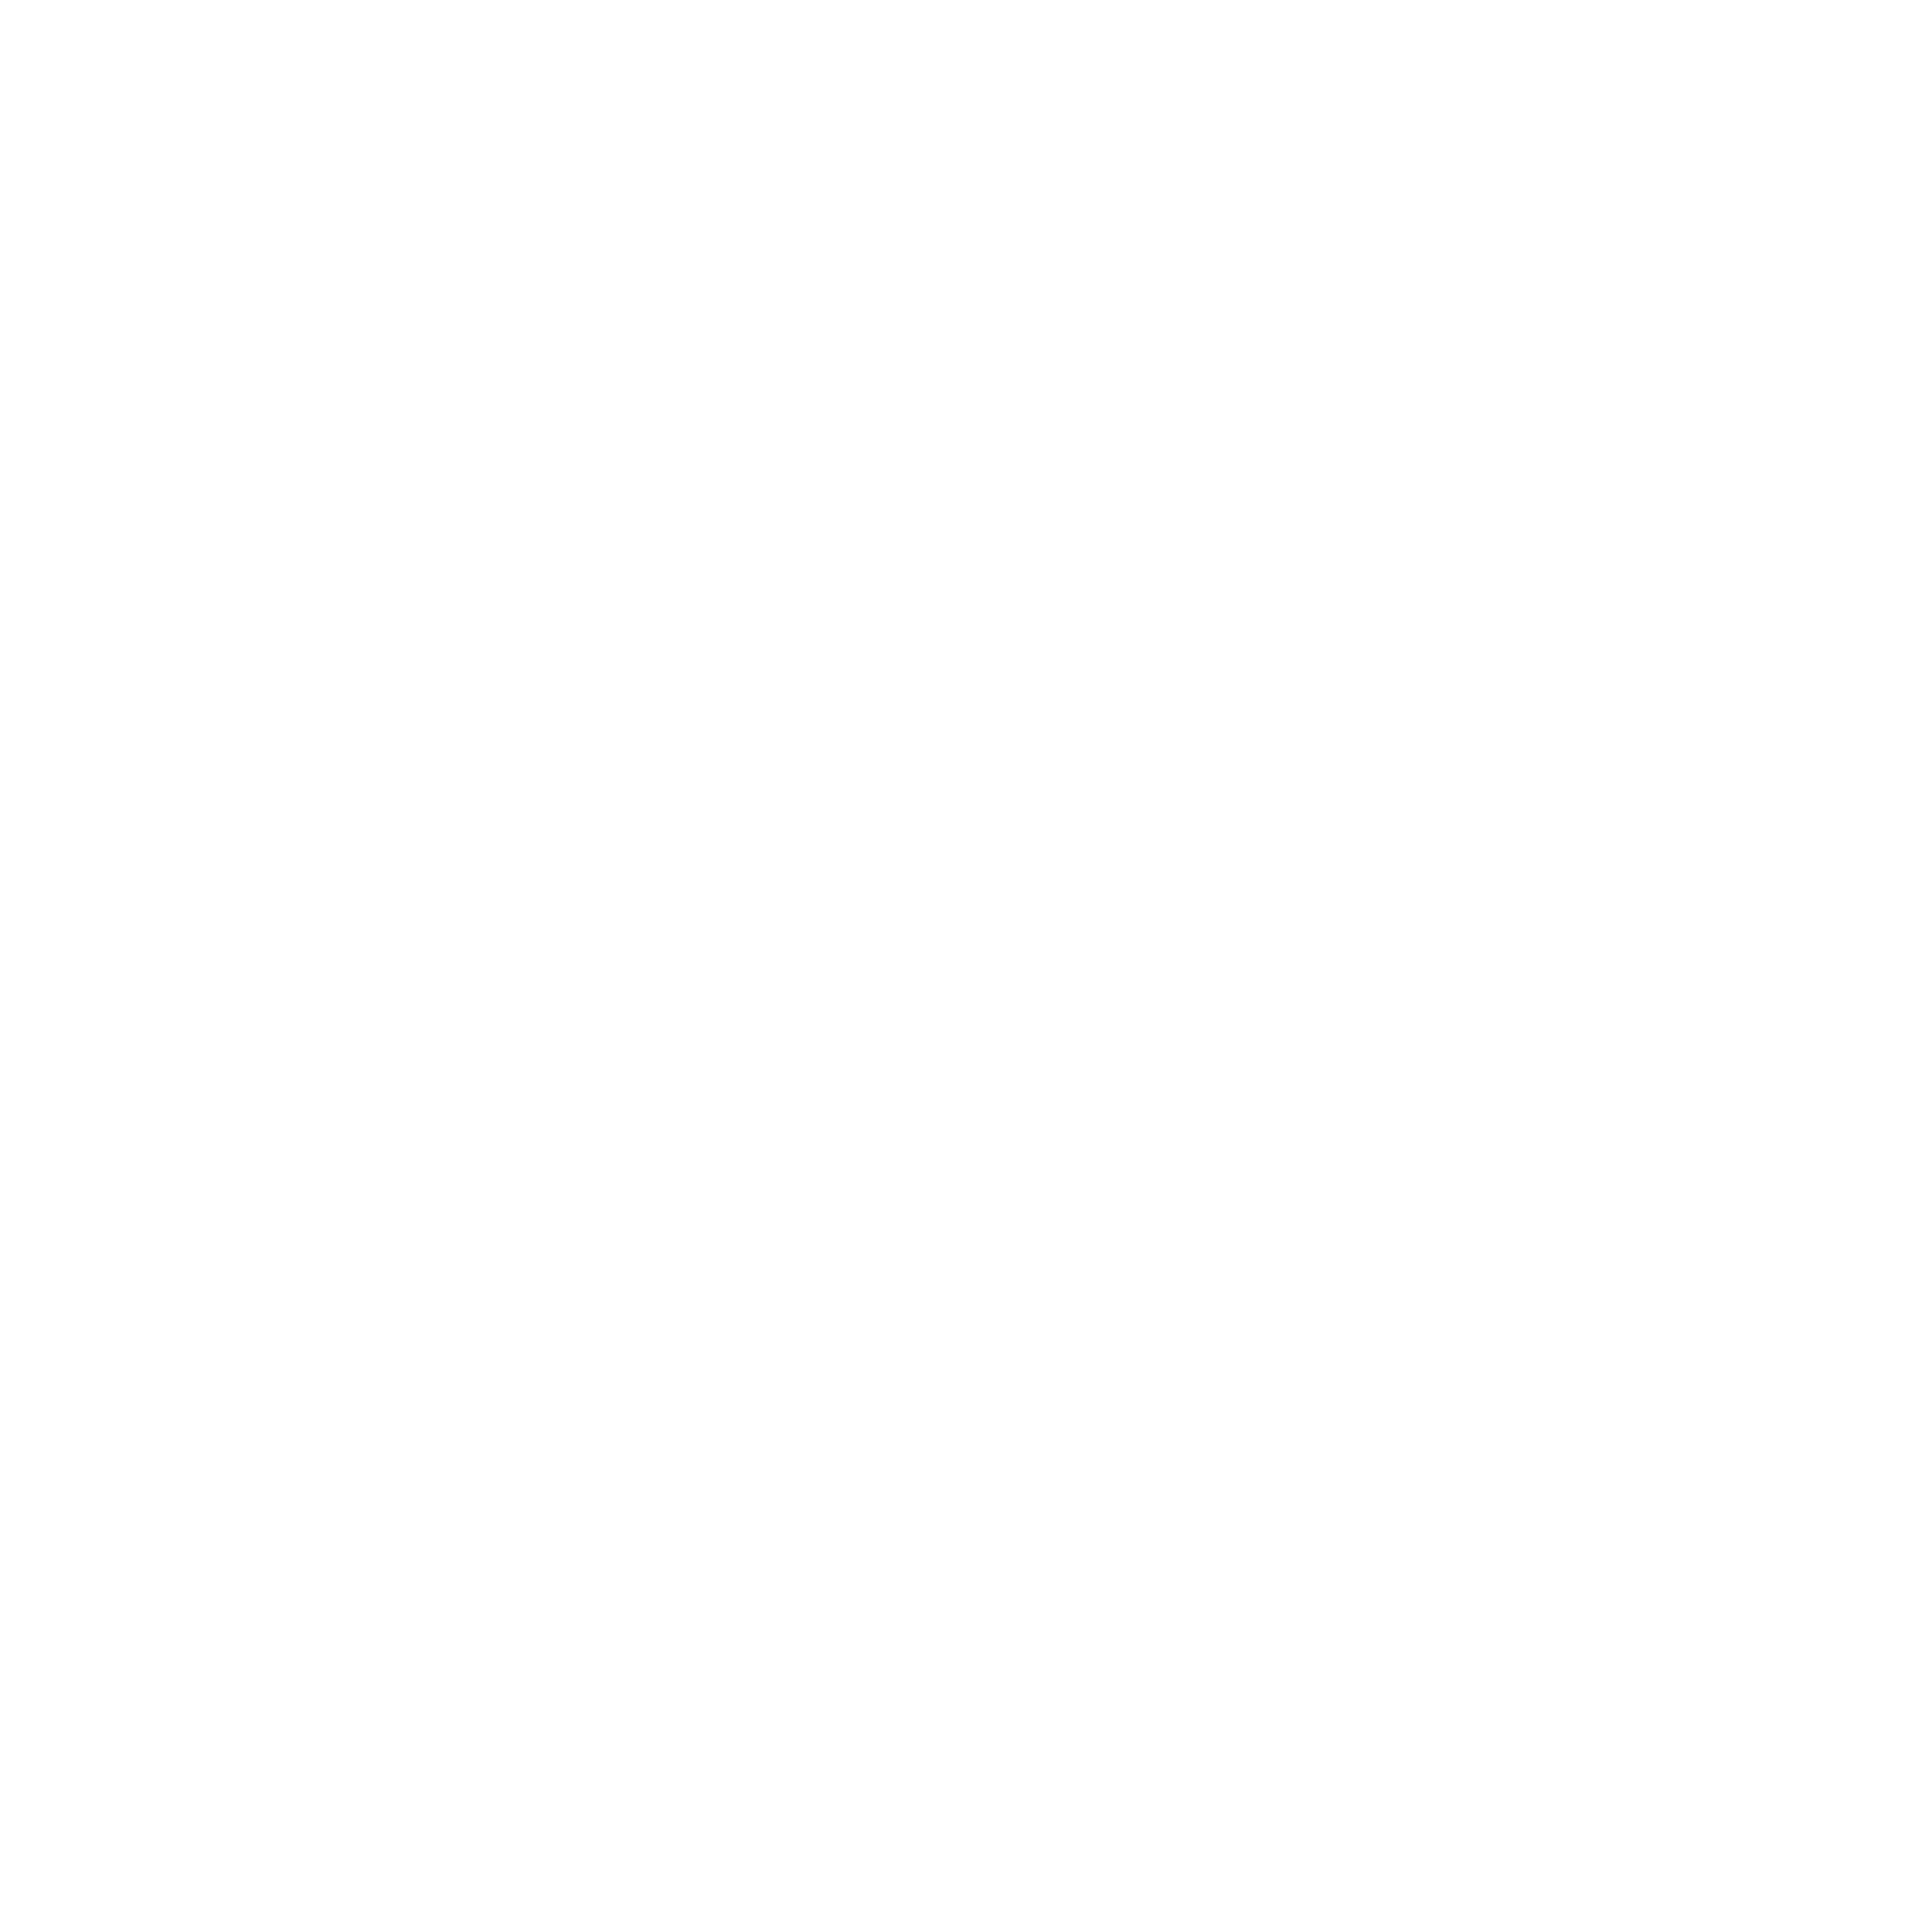 WalkAway White Logo